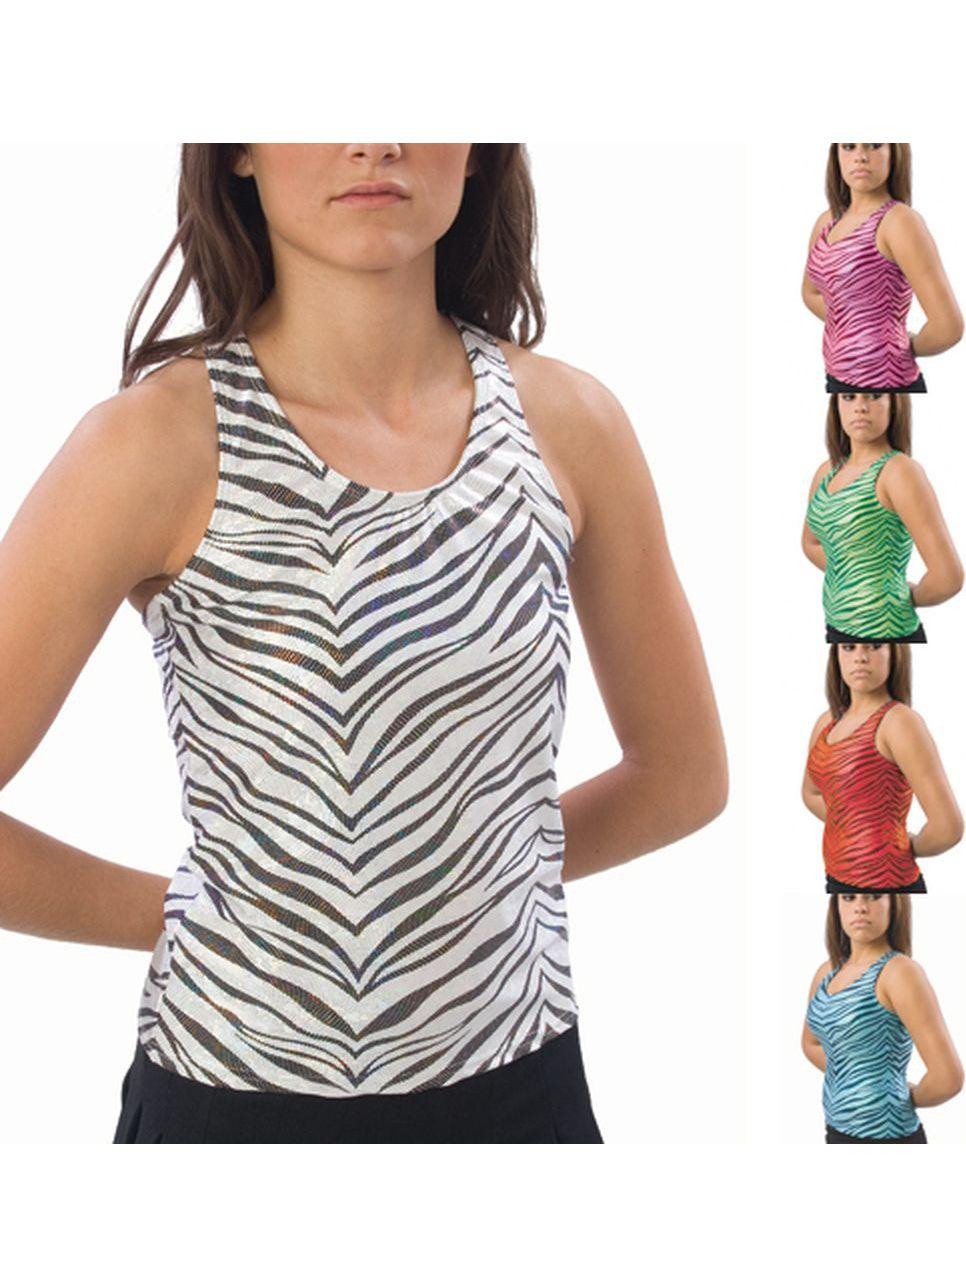 Pizzazz Girls Multi Color Zebra Glitter Racer Back Top Youth